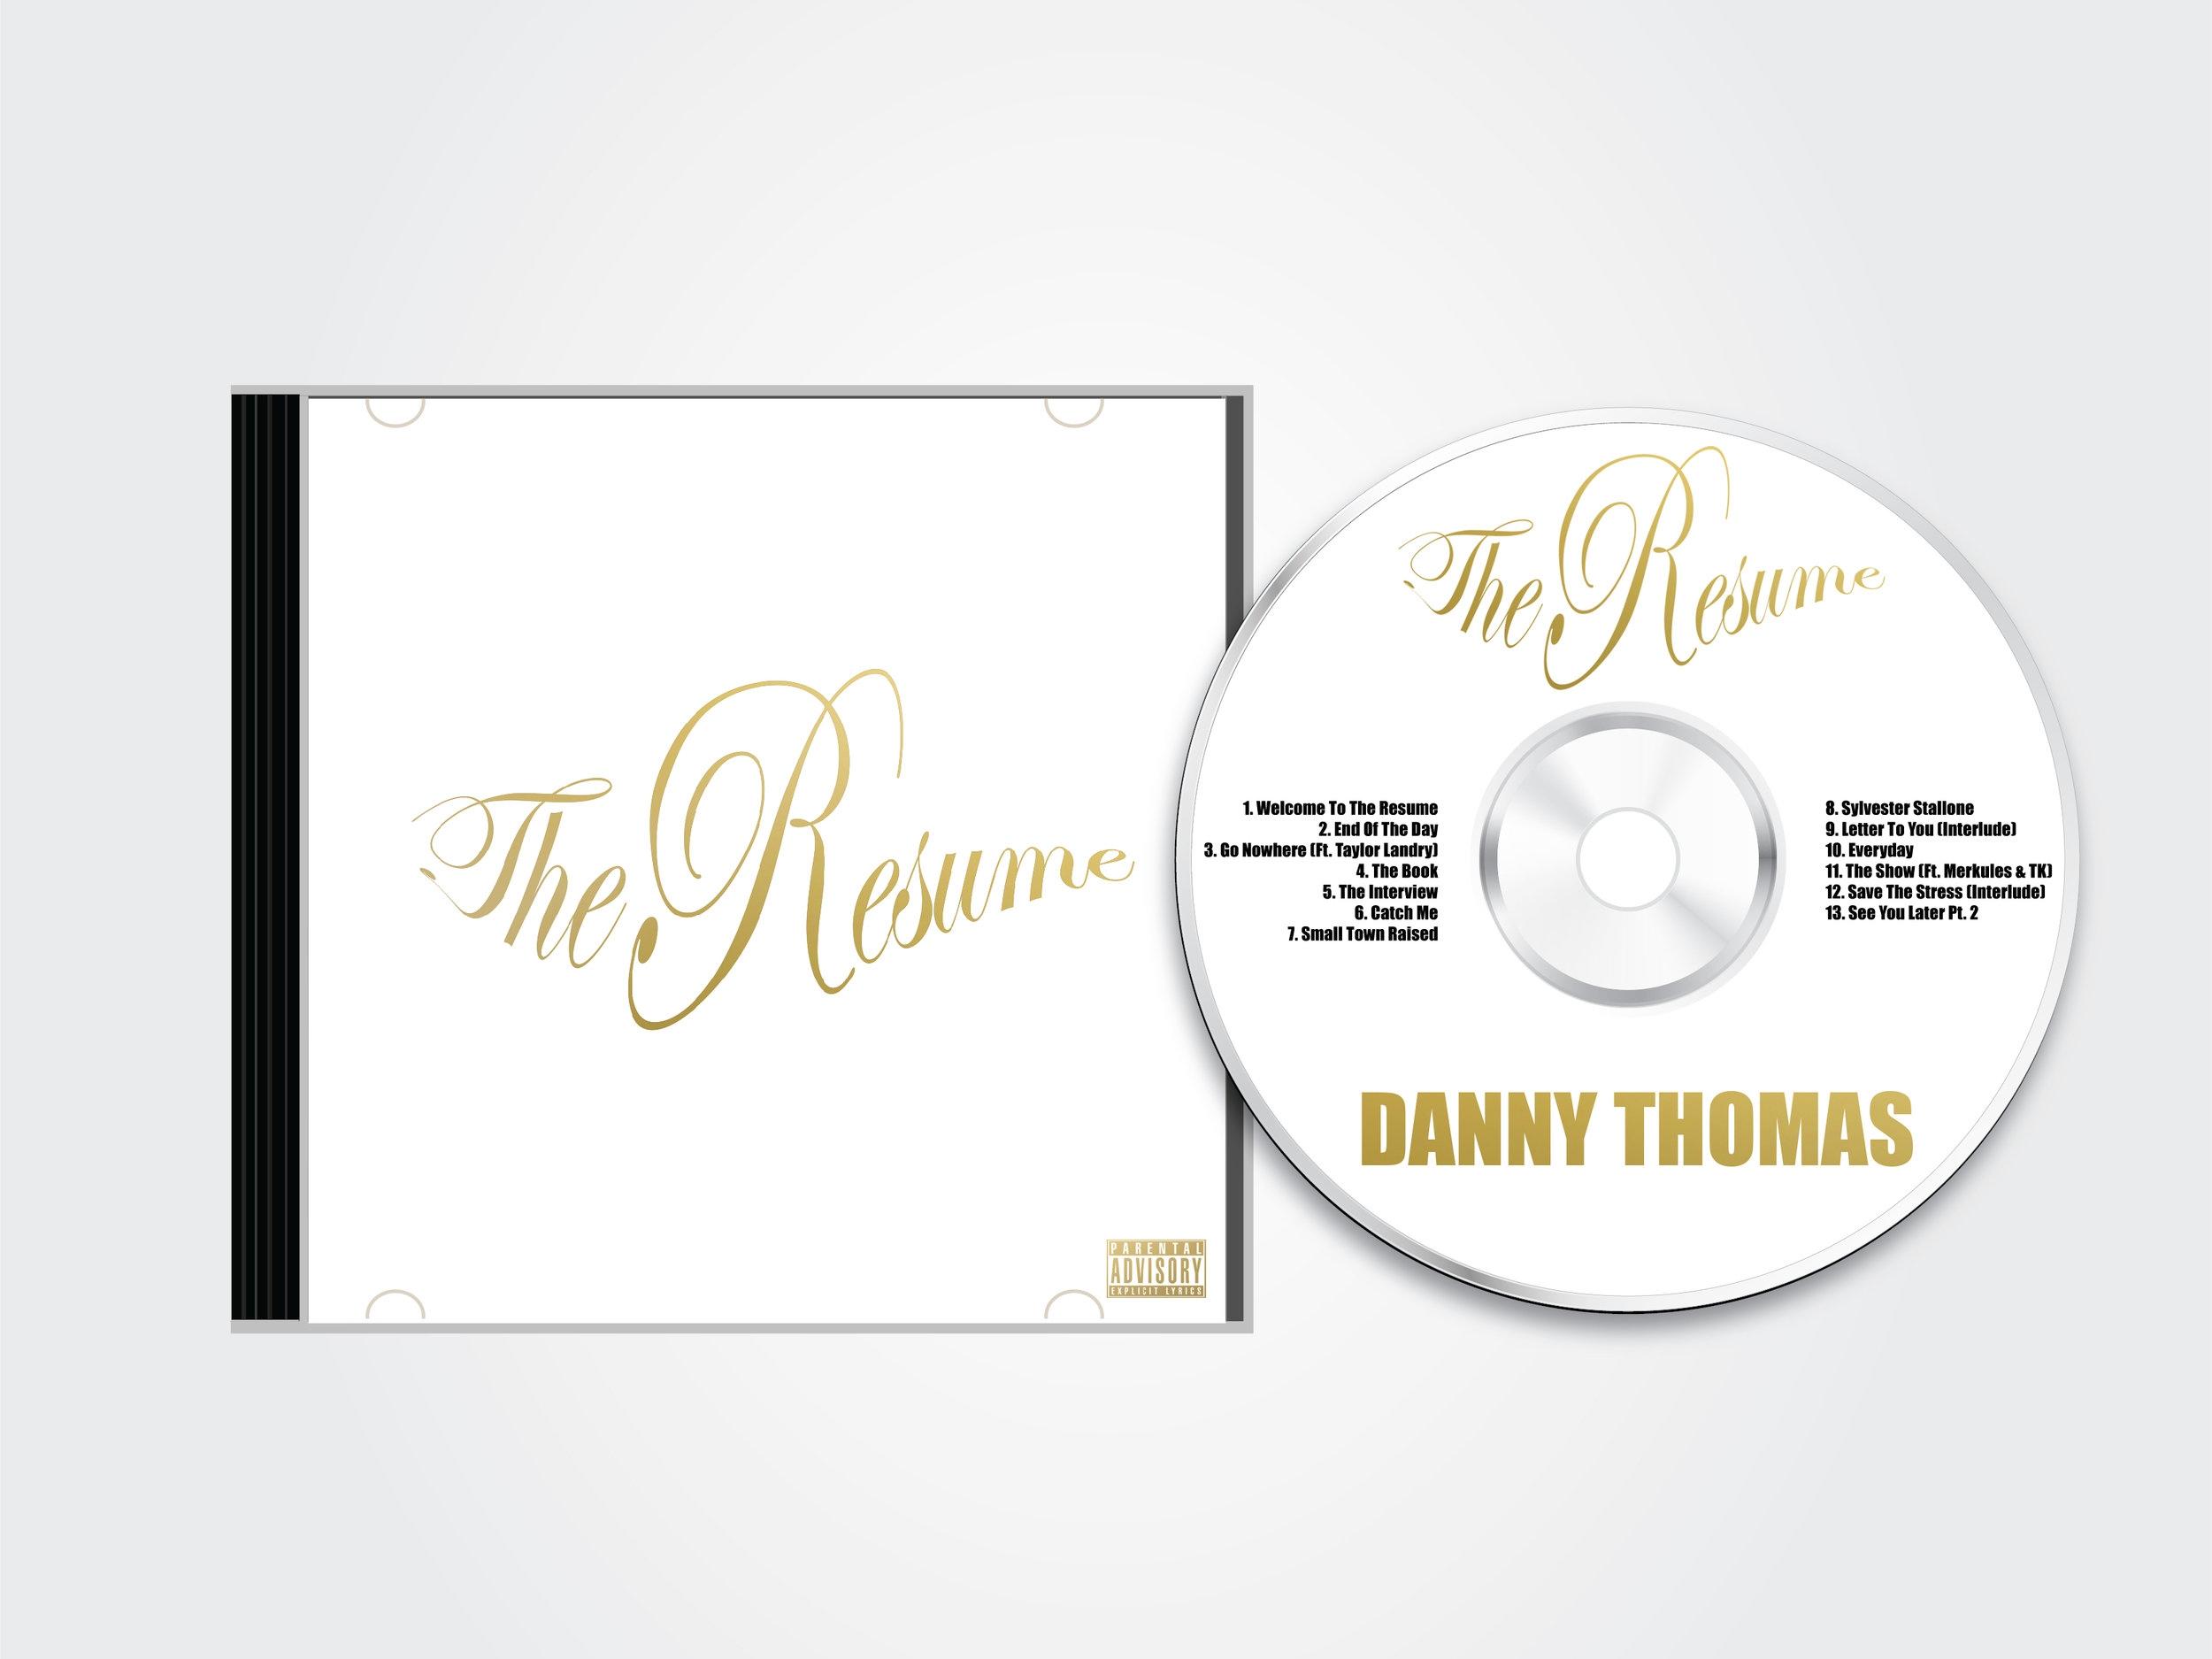 Danny-Thomas_The-Resume_Artwork-01.jpg